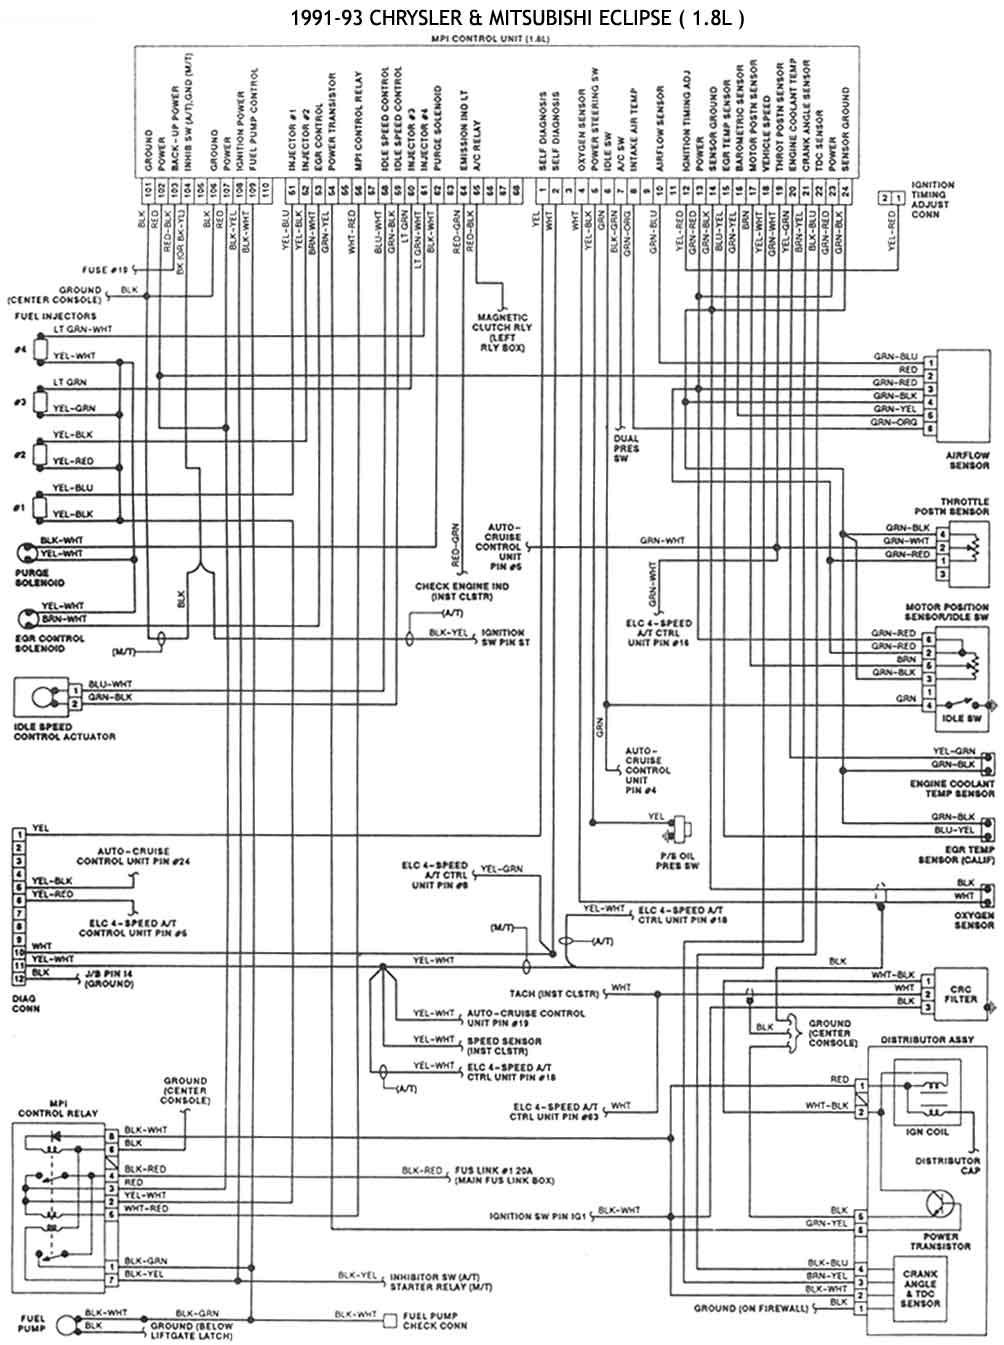 87 Chrysler Lebaron Wiring Diagram Chrysler Mitsubishi 1986 93 Diagramas Esquemas